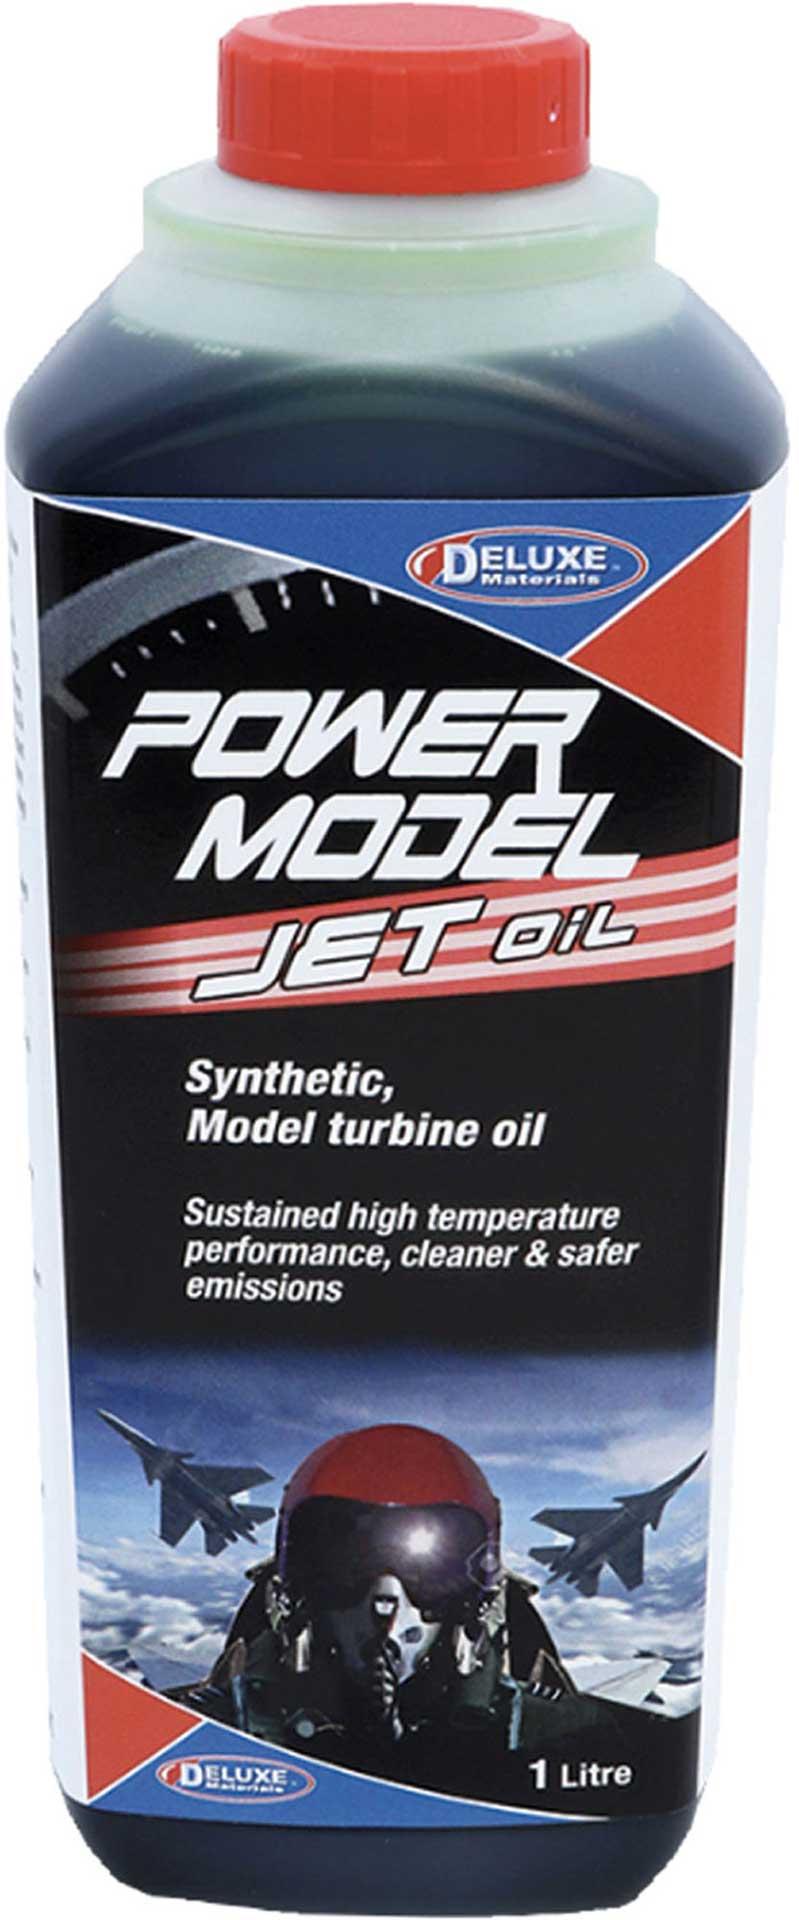 DELUXE Turbine jet oil 1 Litre